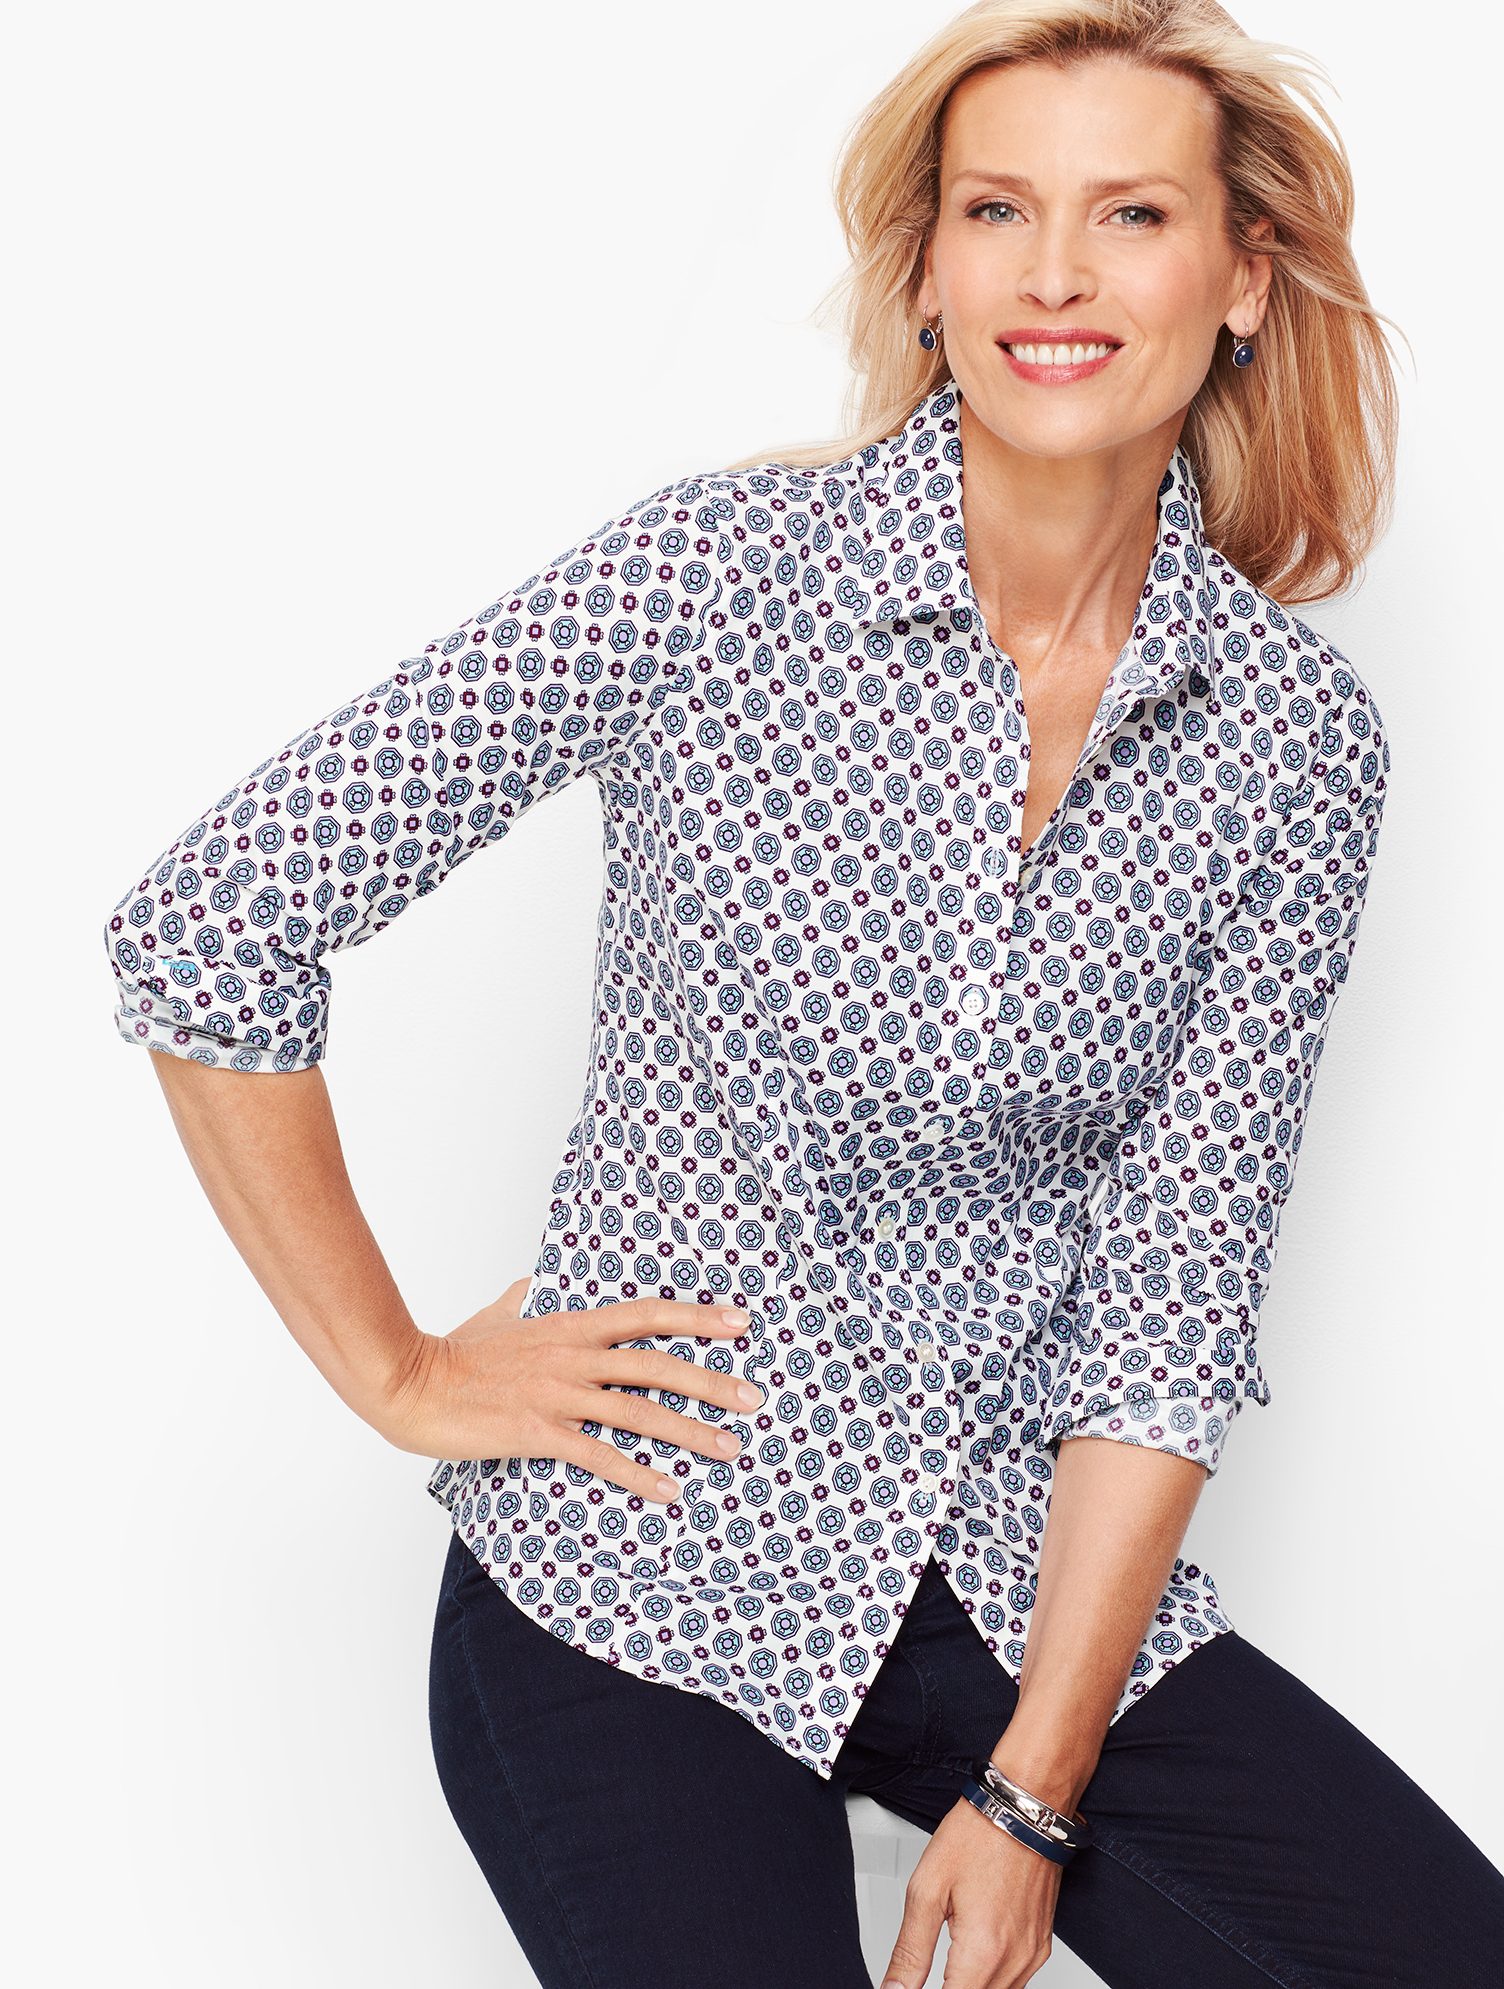 60s Shirts, T-shirt, Blouses, Hippie Shirts Perfect Shirt - Geo Hearts - WHITE-MULTI - 16 - Talbots $64.99 AT vintagedancer.com